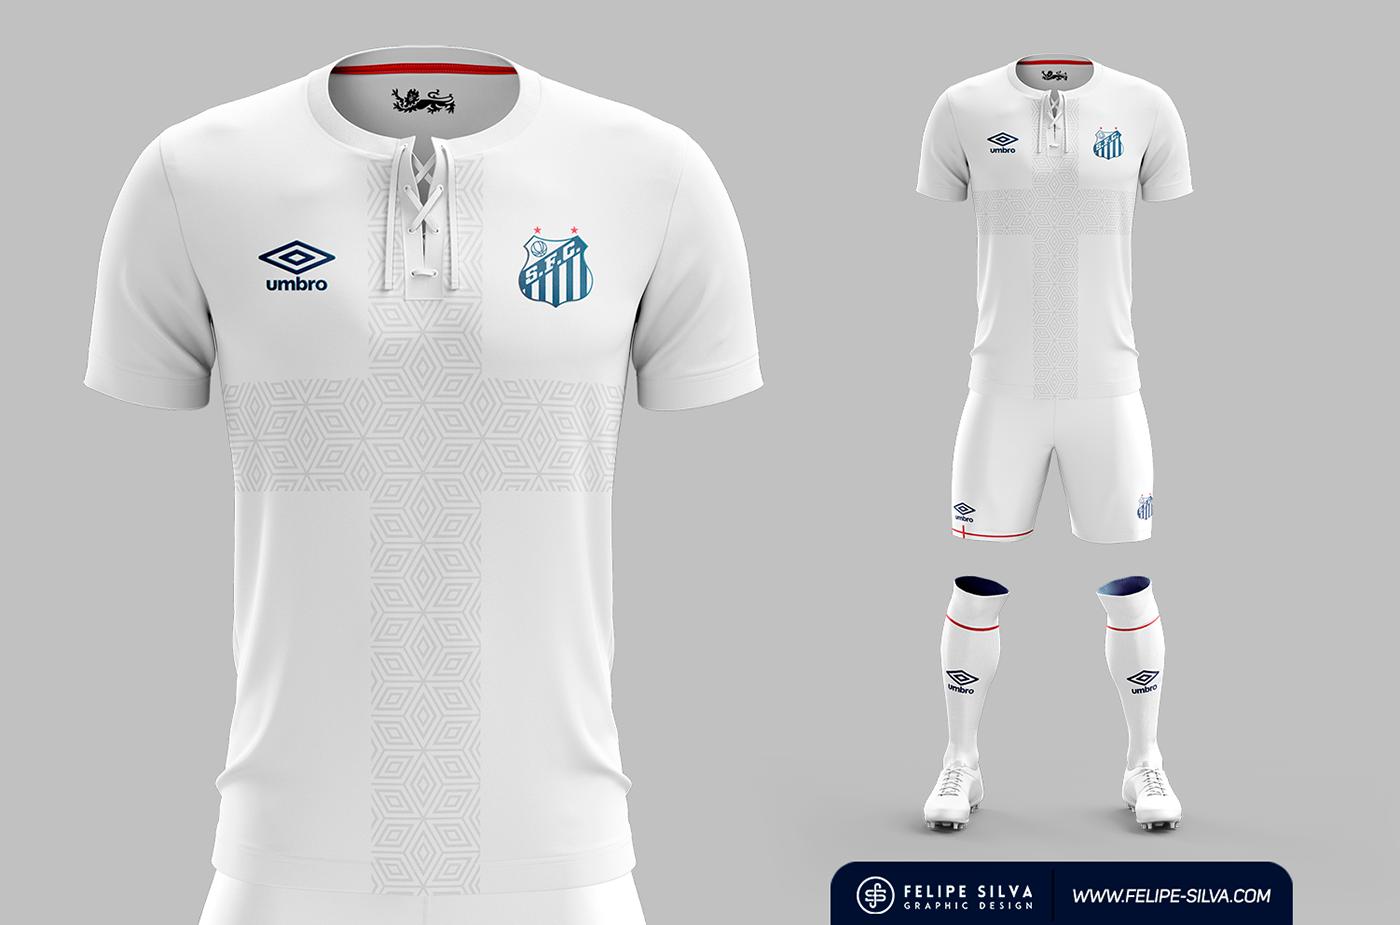 Download Umbro Nations 2018 On Behance Soccer Uniforms Design Sports Uniforms Umbro